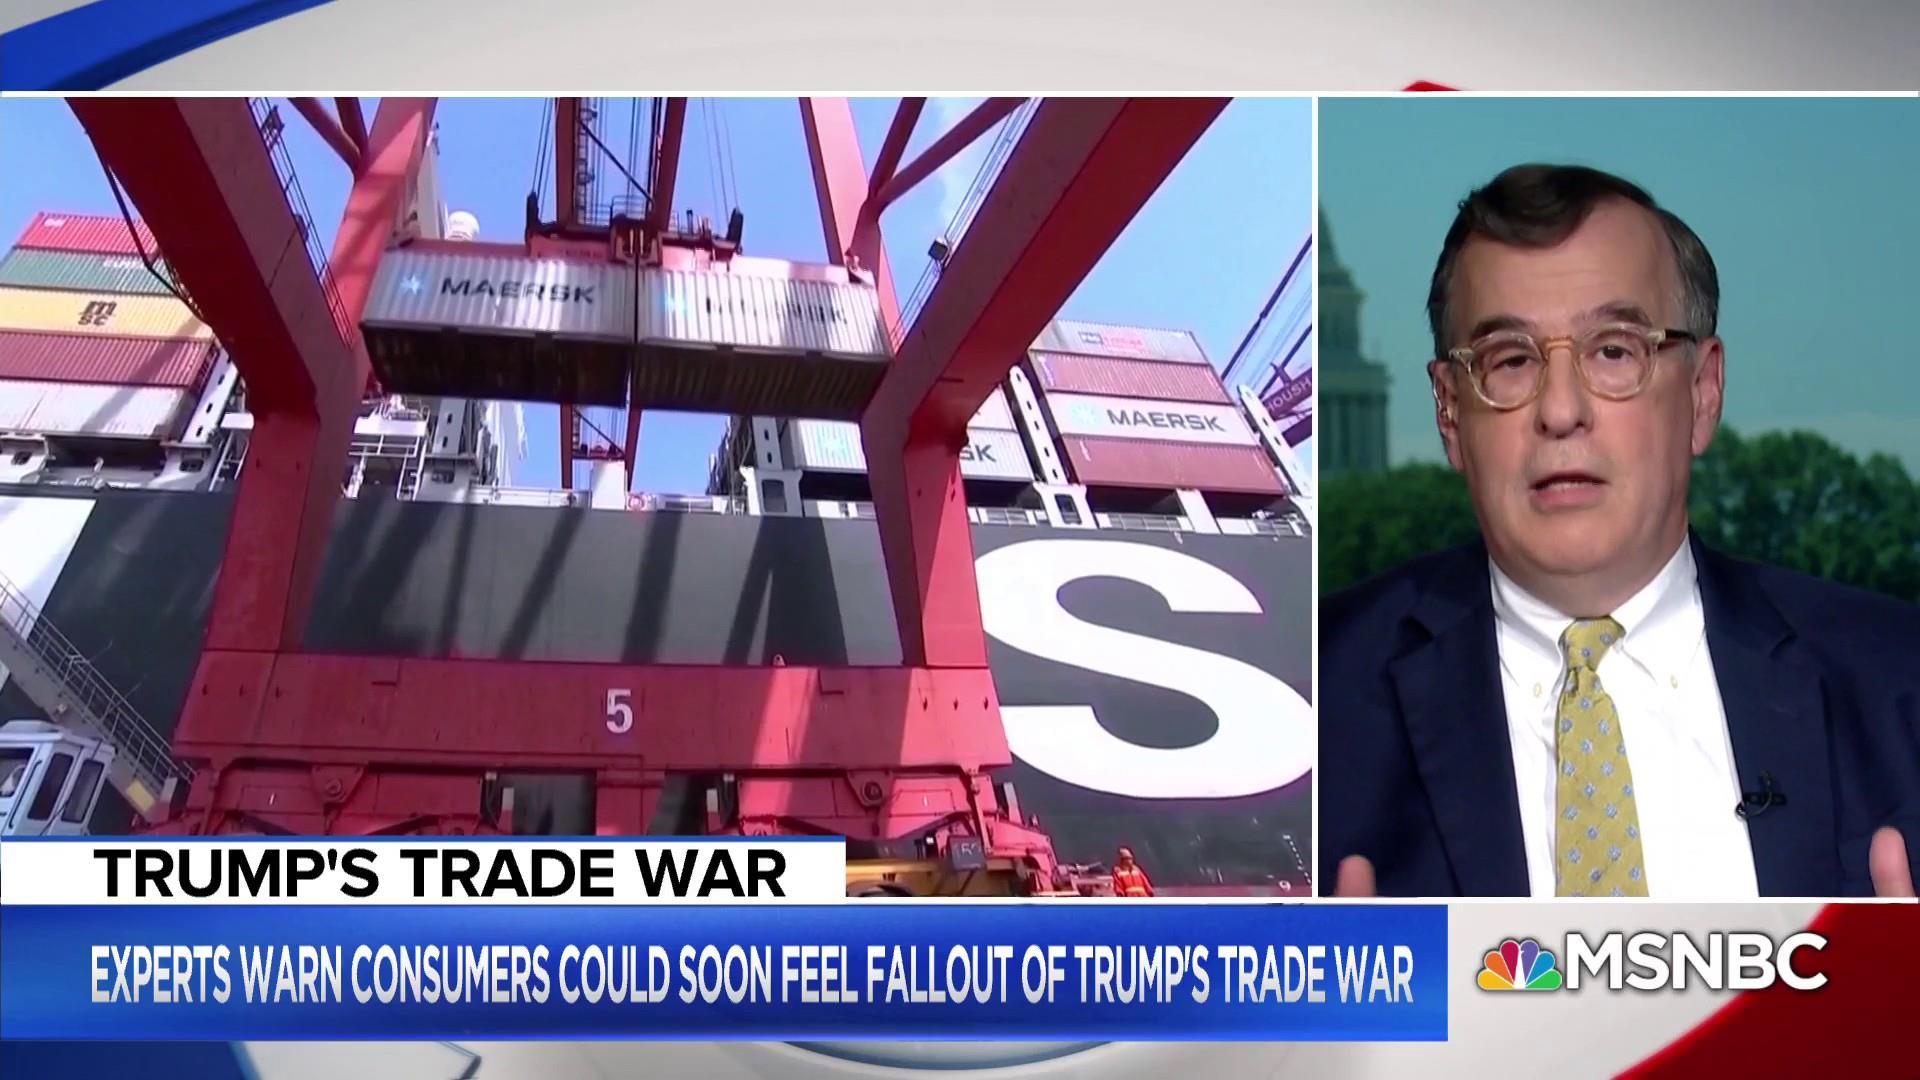 President Trump's trade war might not hurt him politically